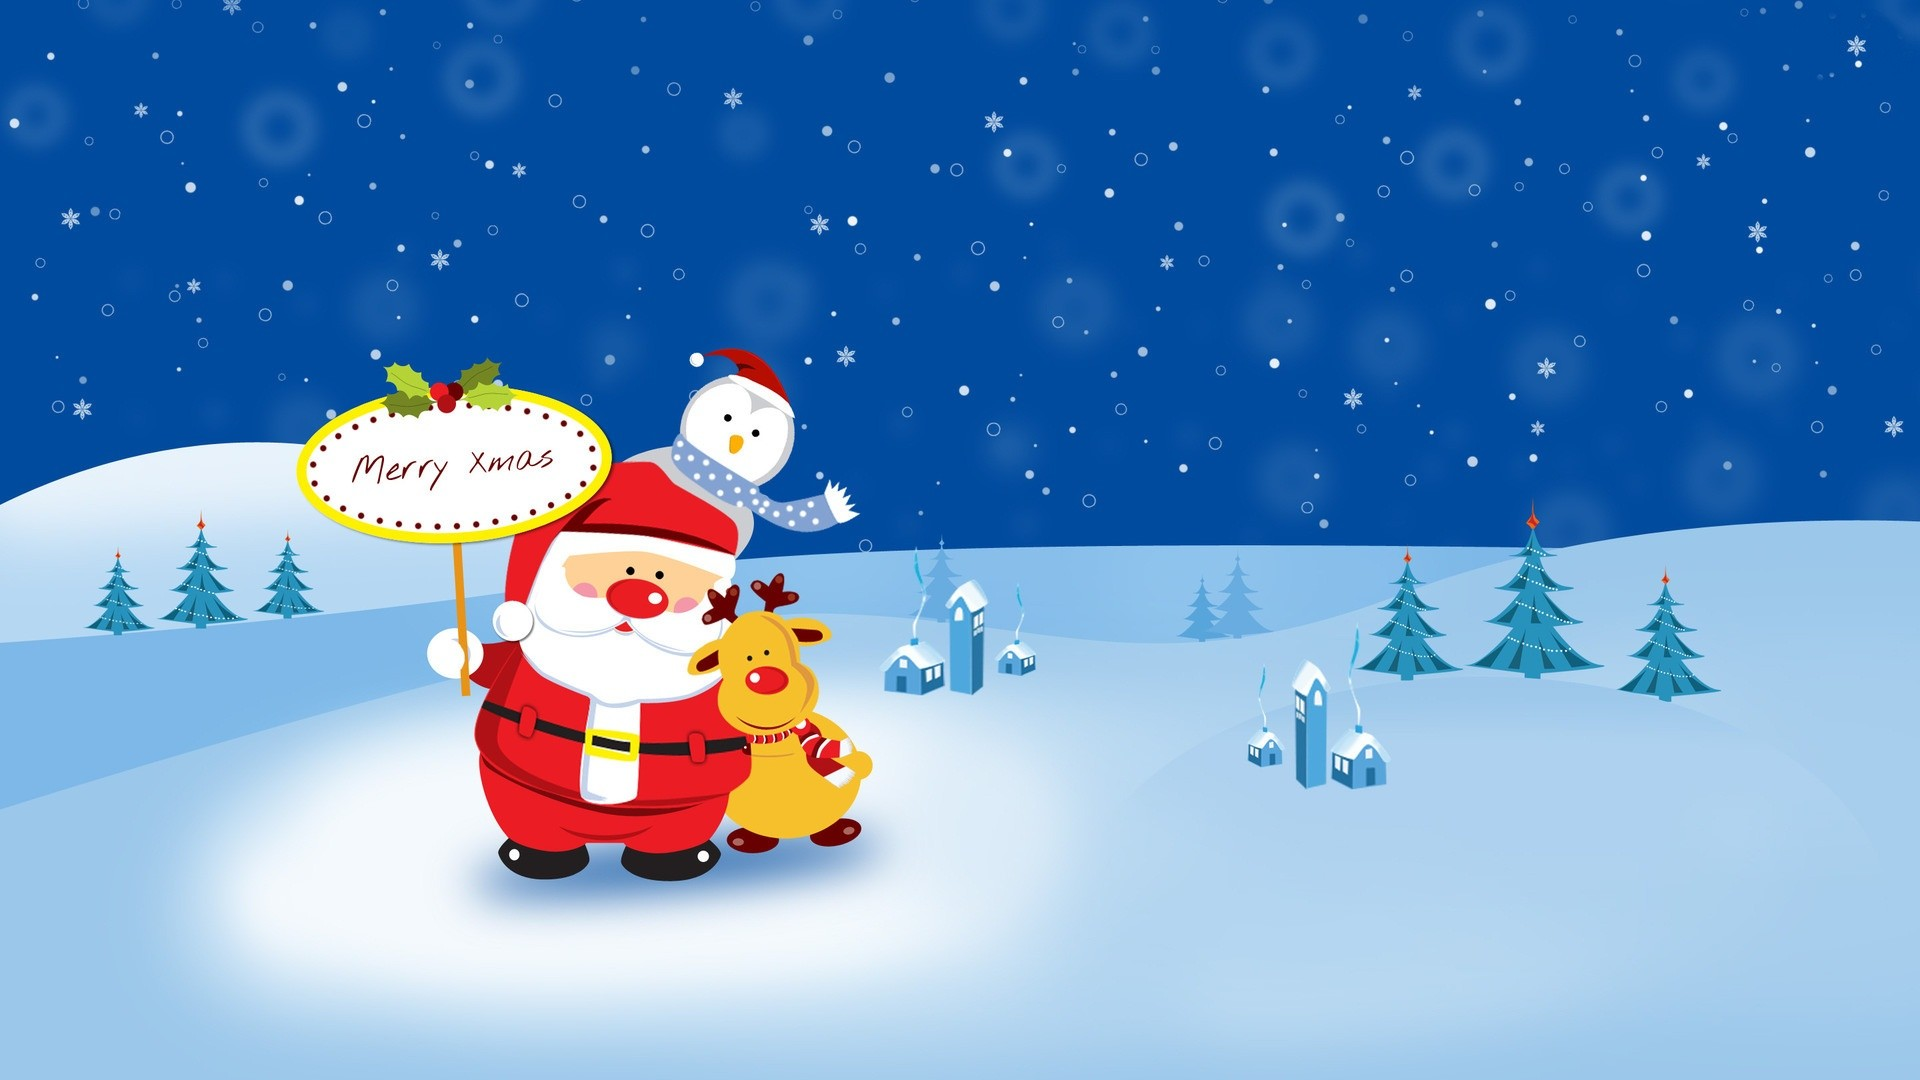 Cute Christmas Phone Wallpaper 56 Images